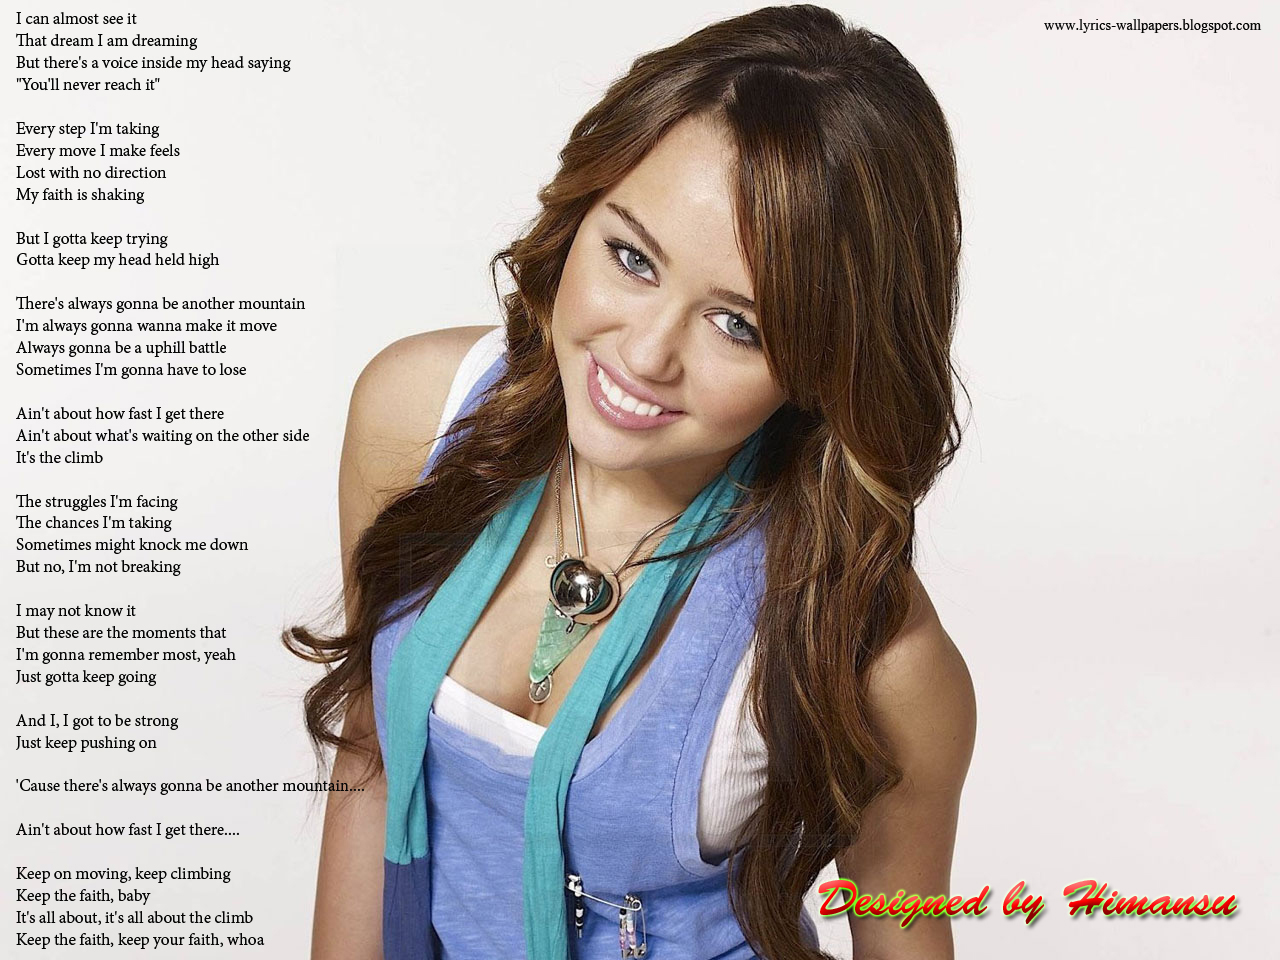 Lyrics Wallpapers: Miley Cyrus - The Climb